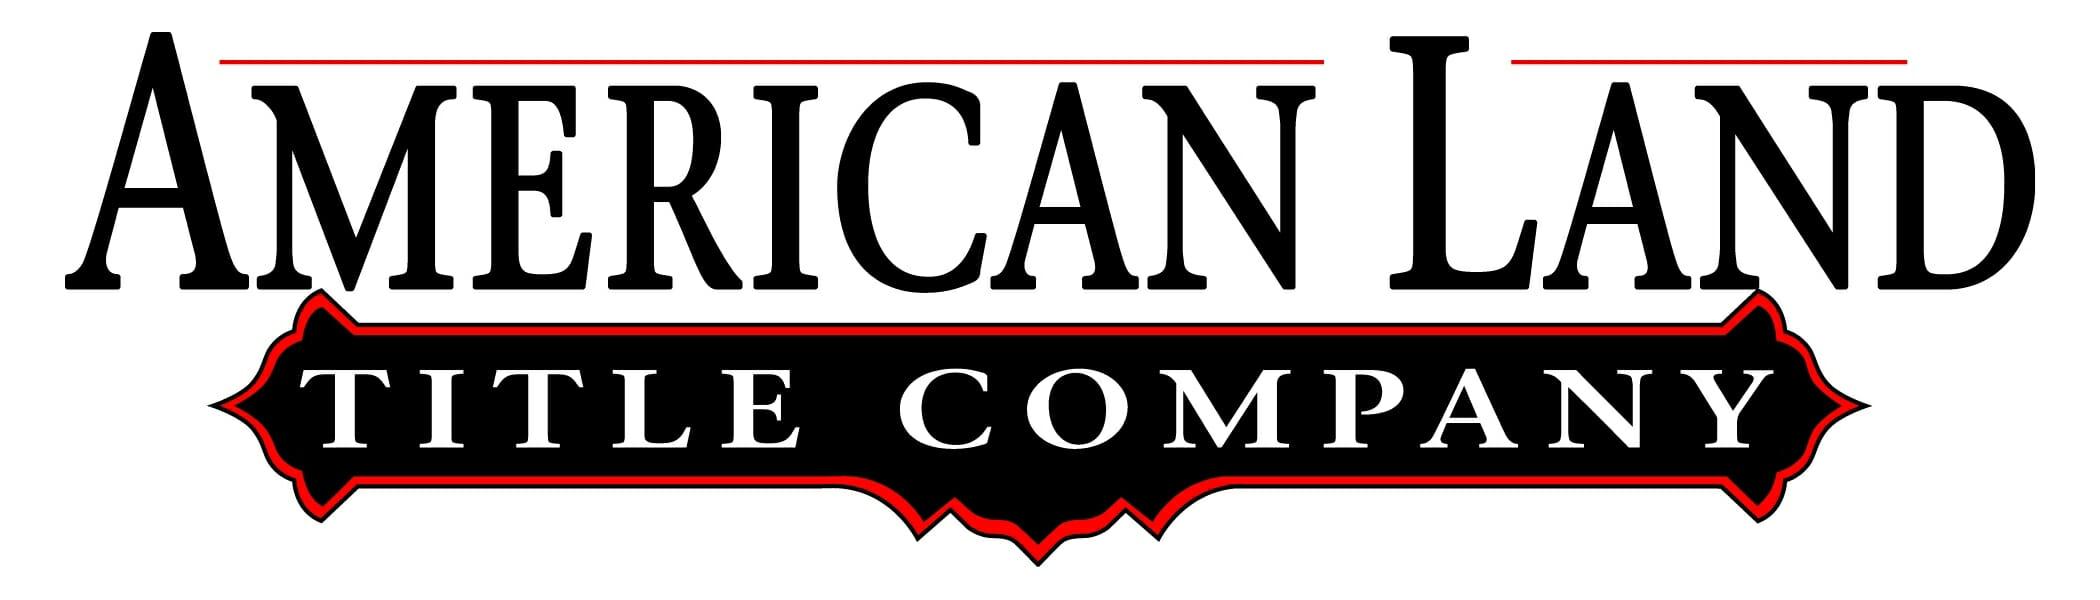 ALTC big logo